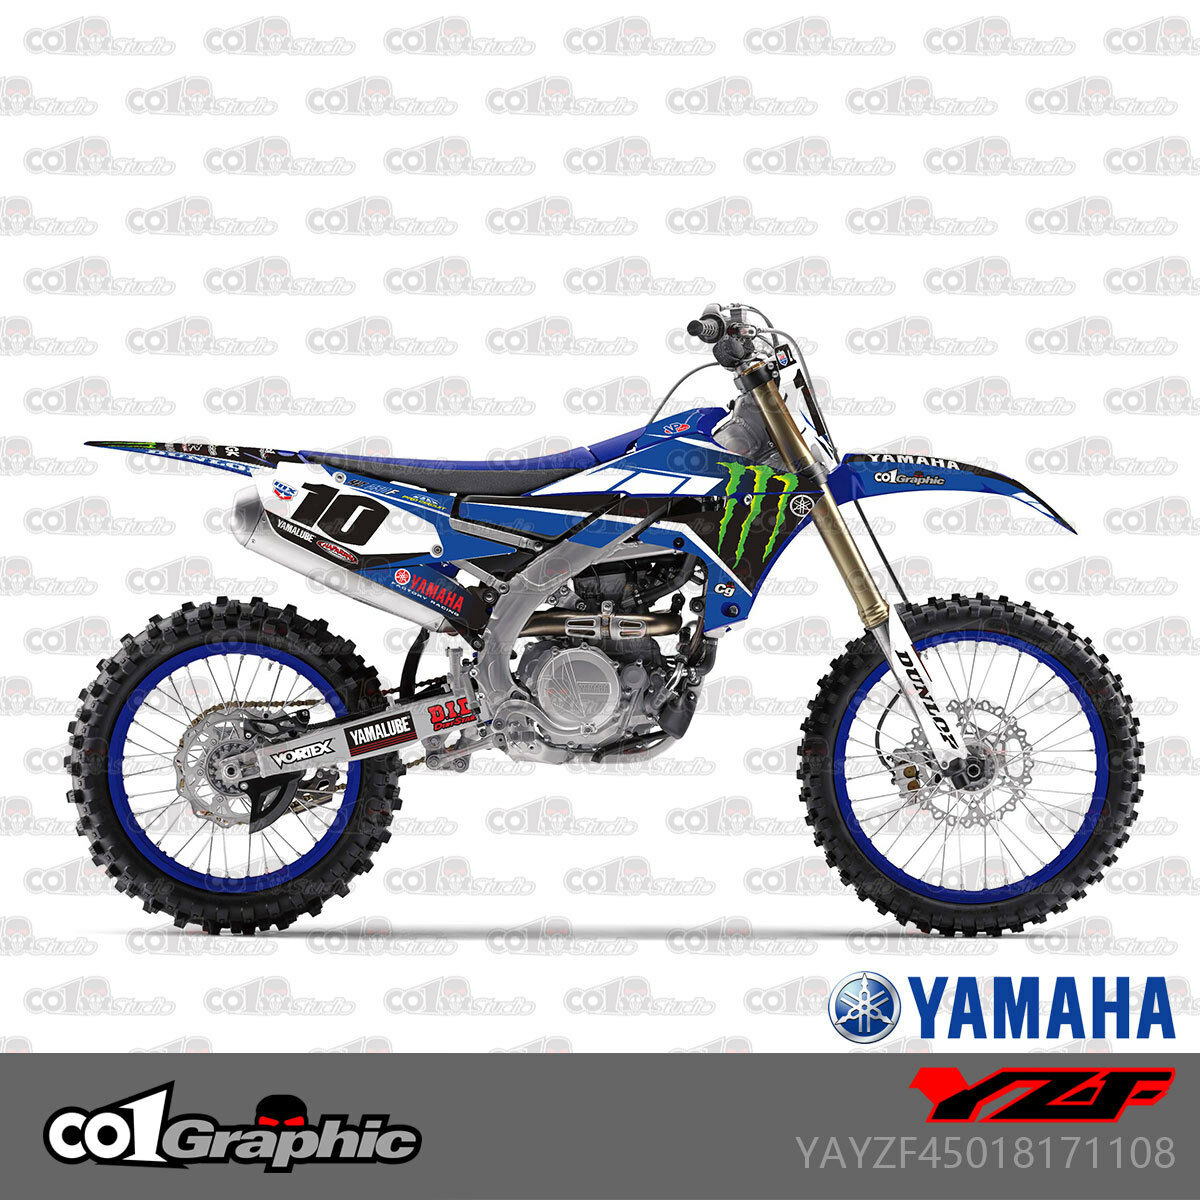 Grafica di sfondo Decal kit Set moto completa di grafica decalcomanie degli autoadesivi kit for Yamaha YZ250 YZ125 1991 1992 125YZ 250 YZ Color : As shown